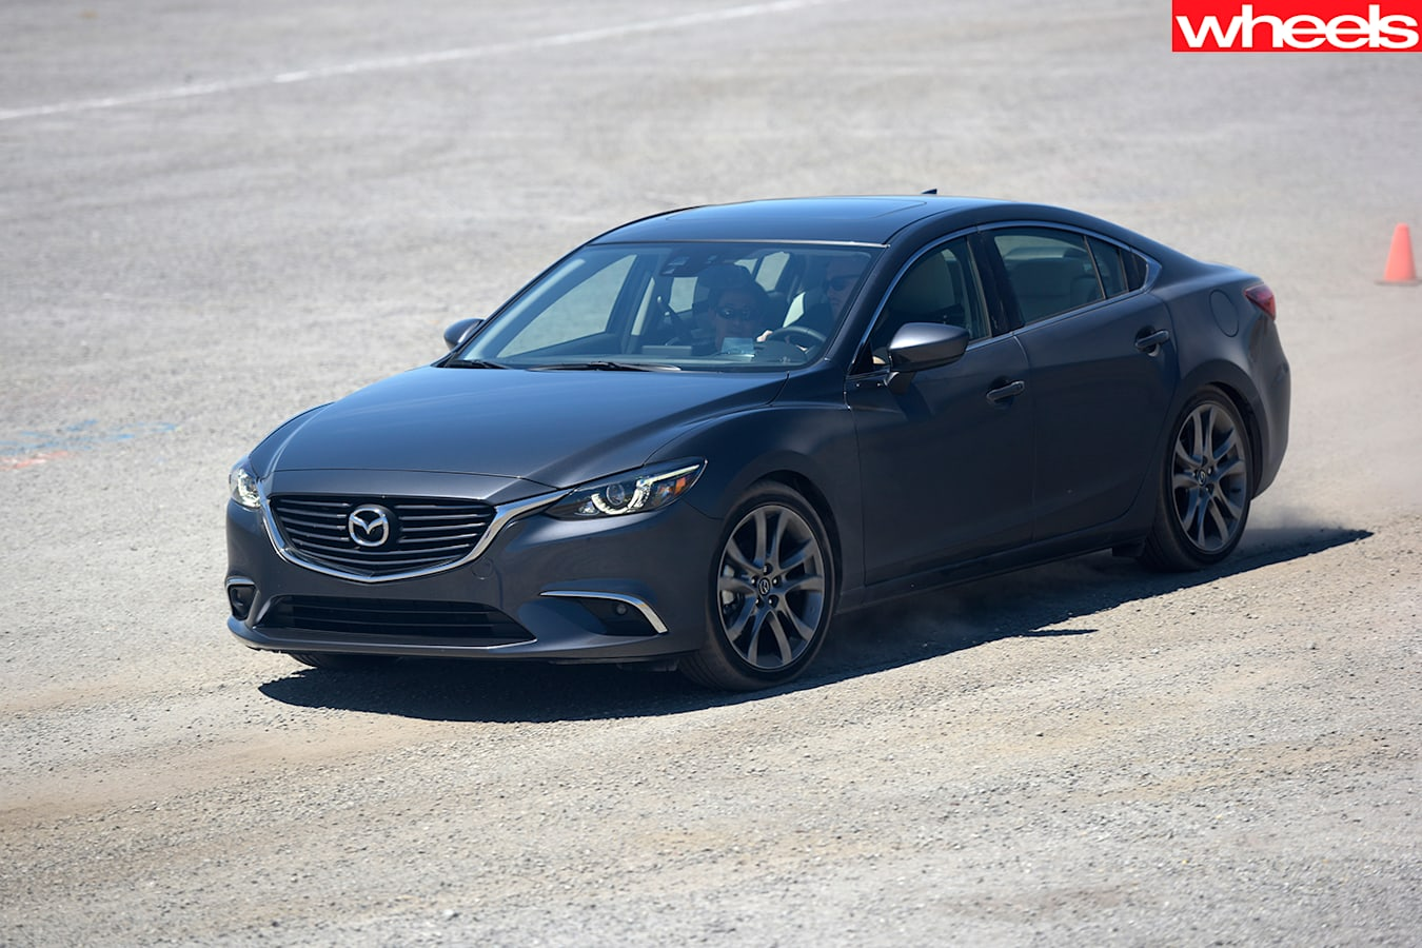 Mazda's G-Vectoring Control